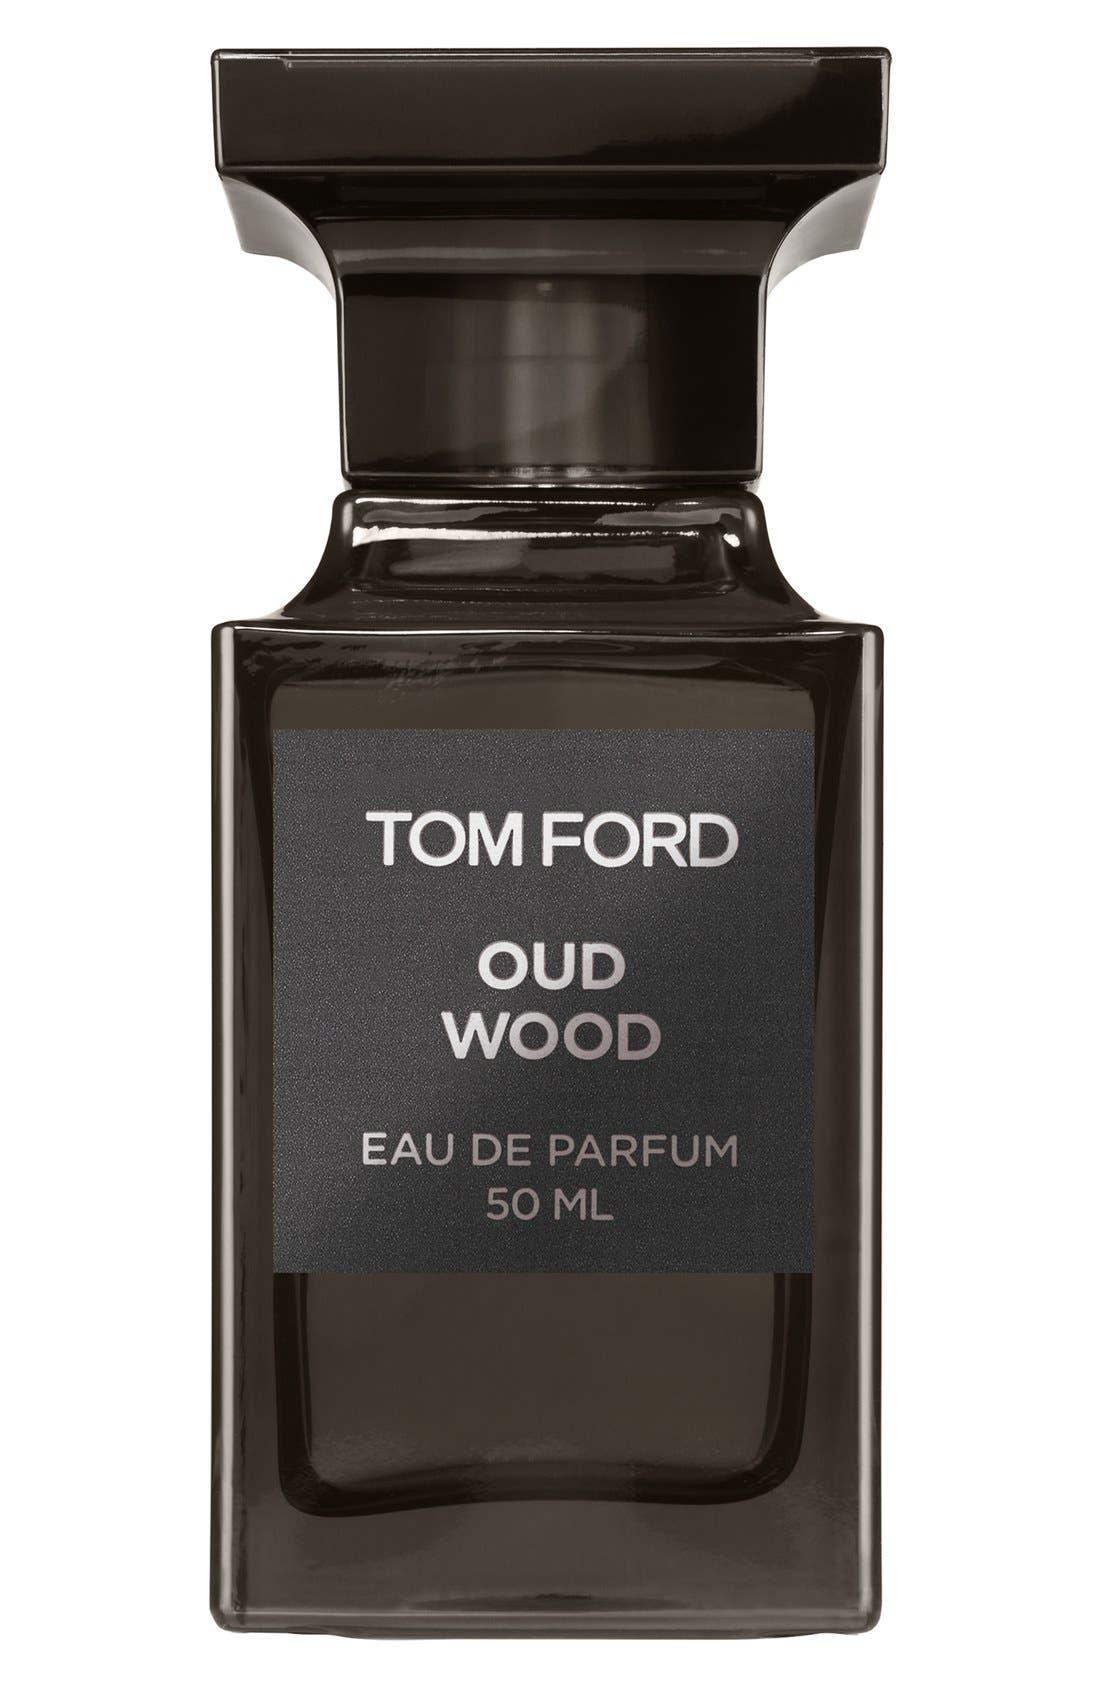 FragranceNordstrom Tom Ford Tom Tom Ford FragranceNordstrom FragranceNordstrom Ford Tom SUzMpVqG